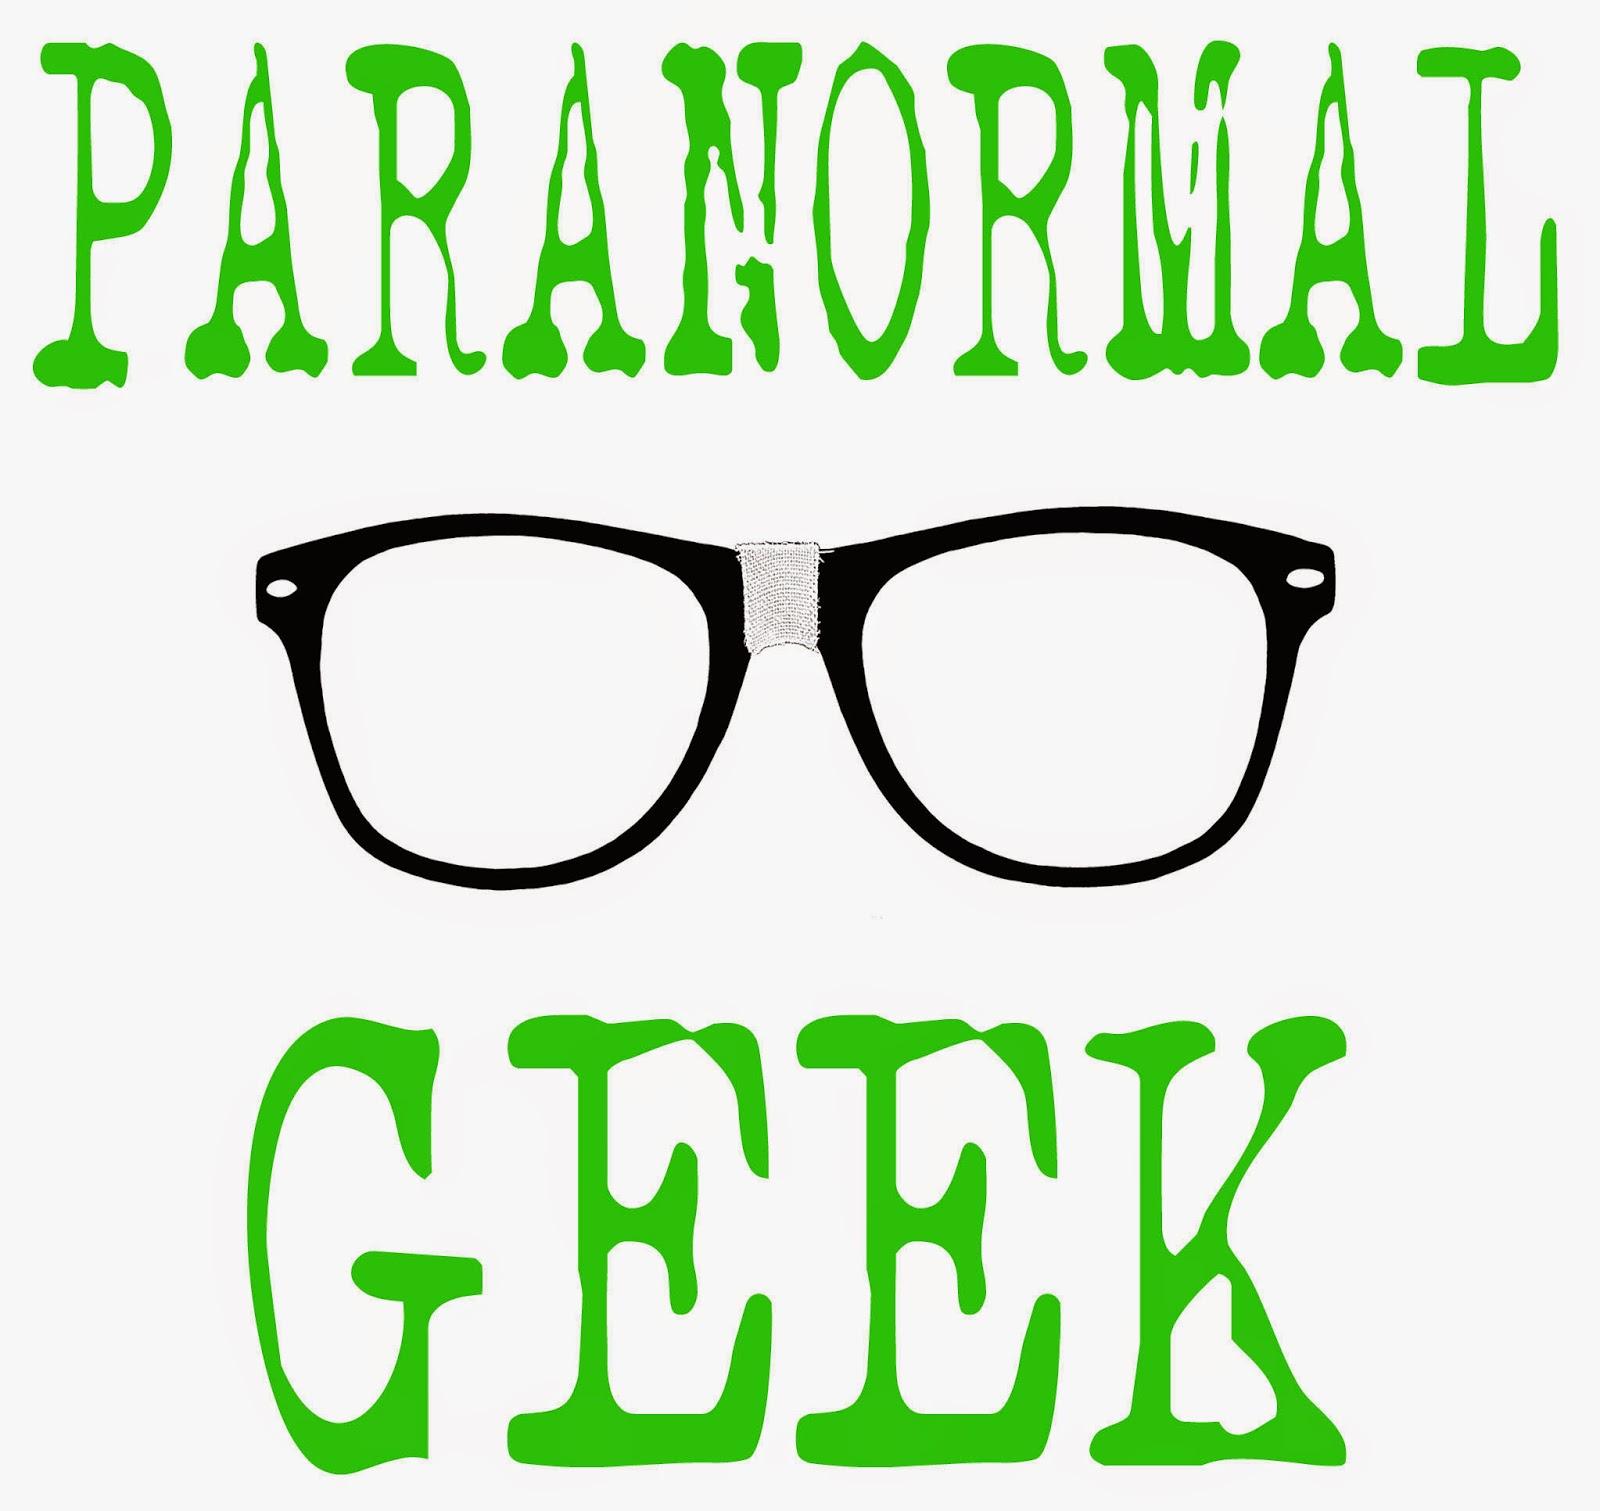 Julie Ferguson Designs: New Paranormal Geek Logos - Attention Earthlings